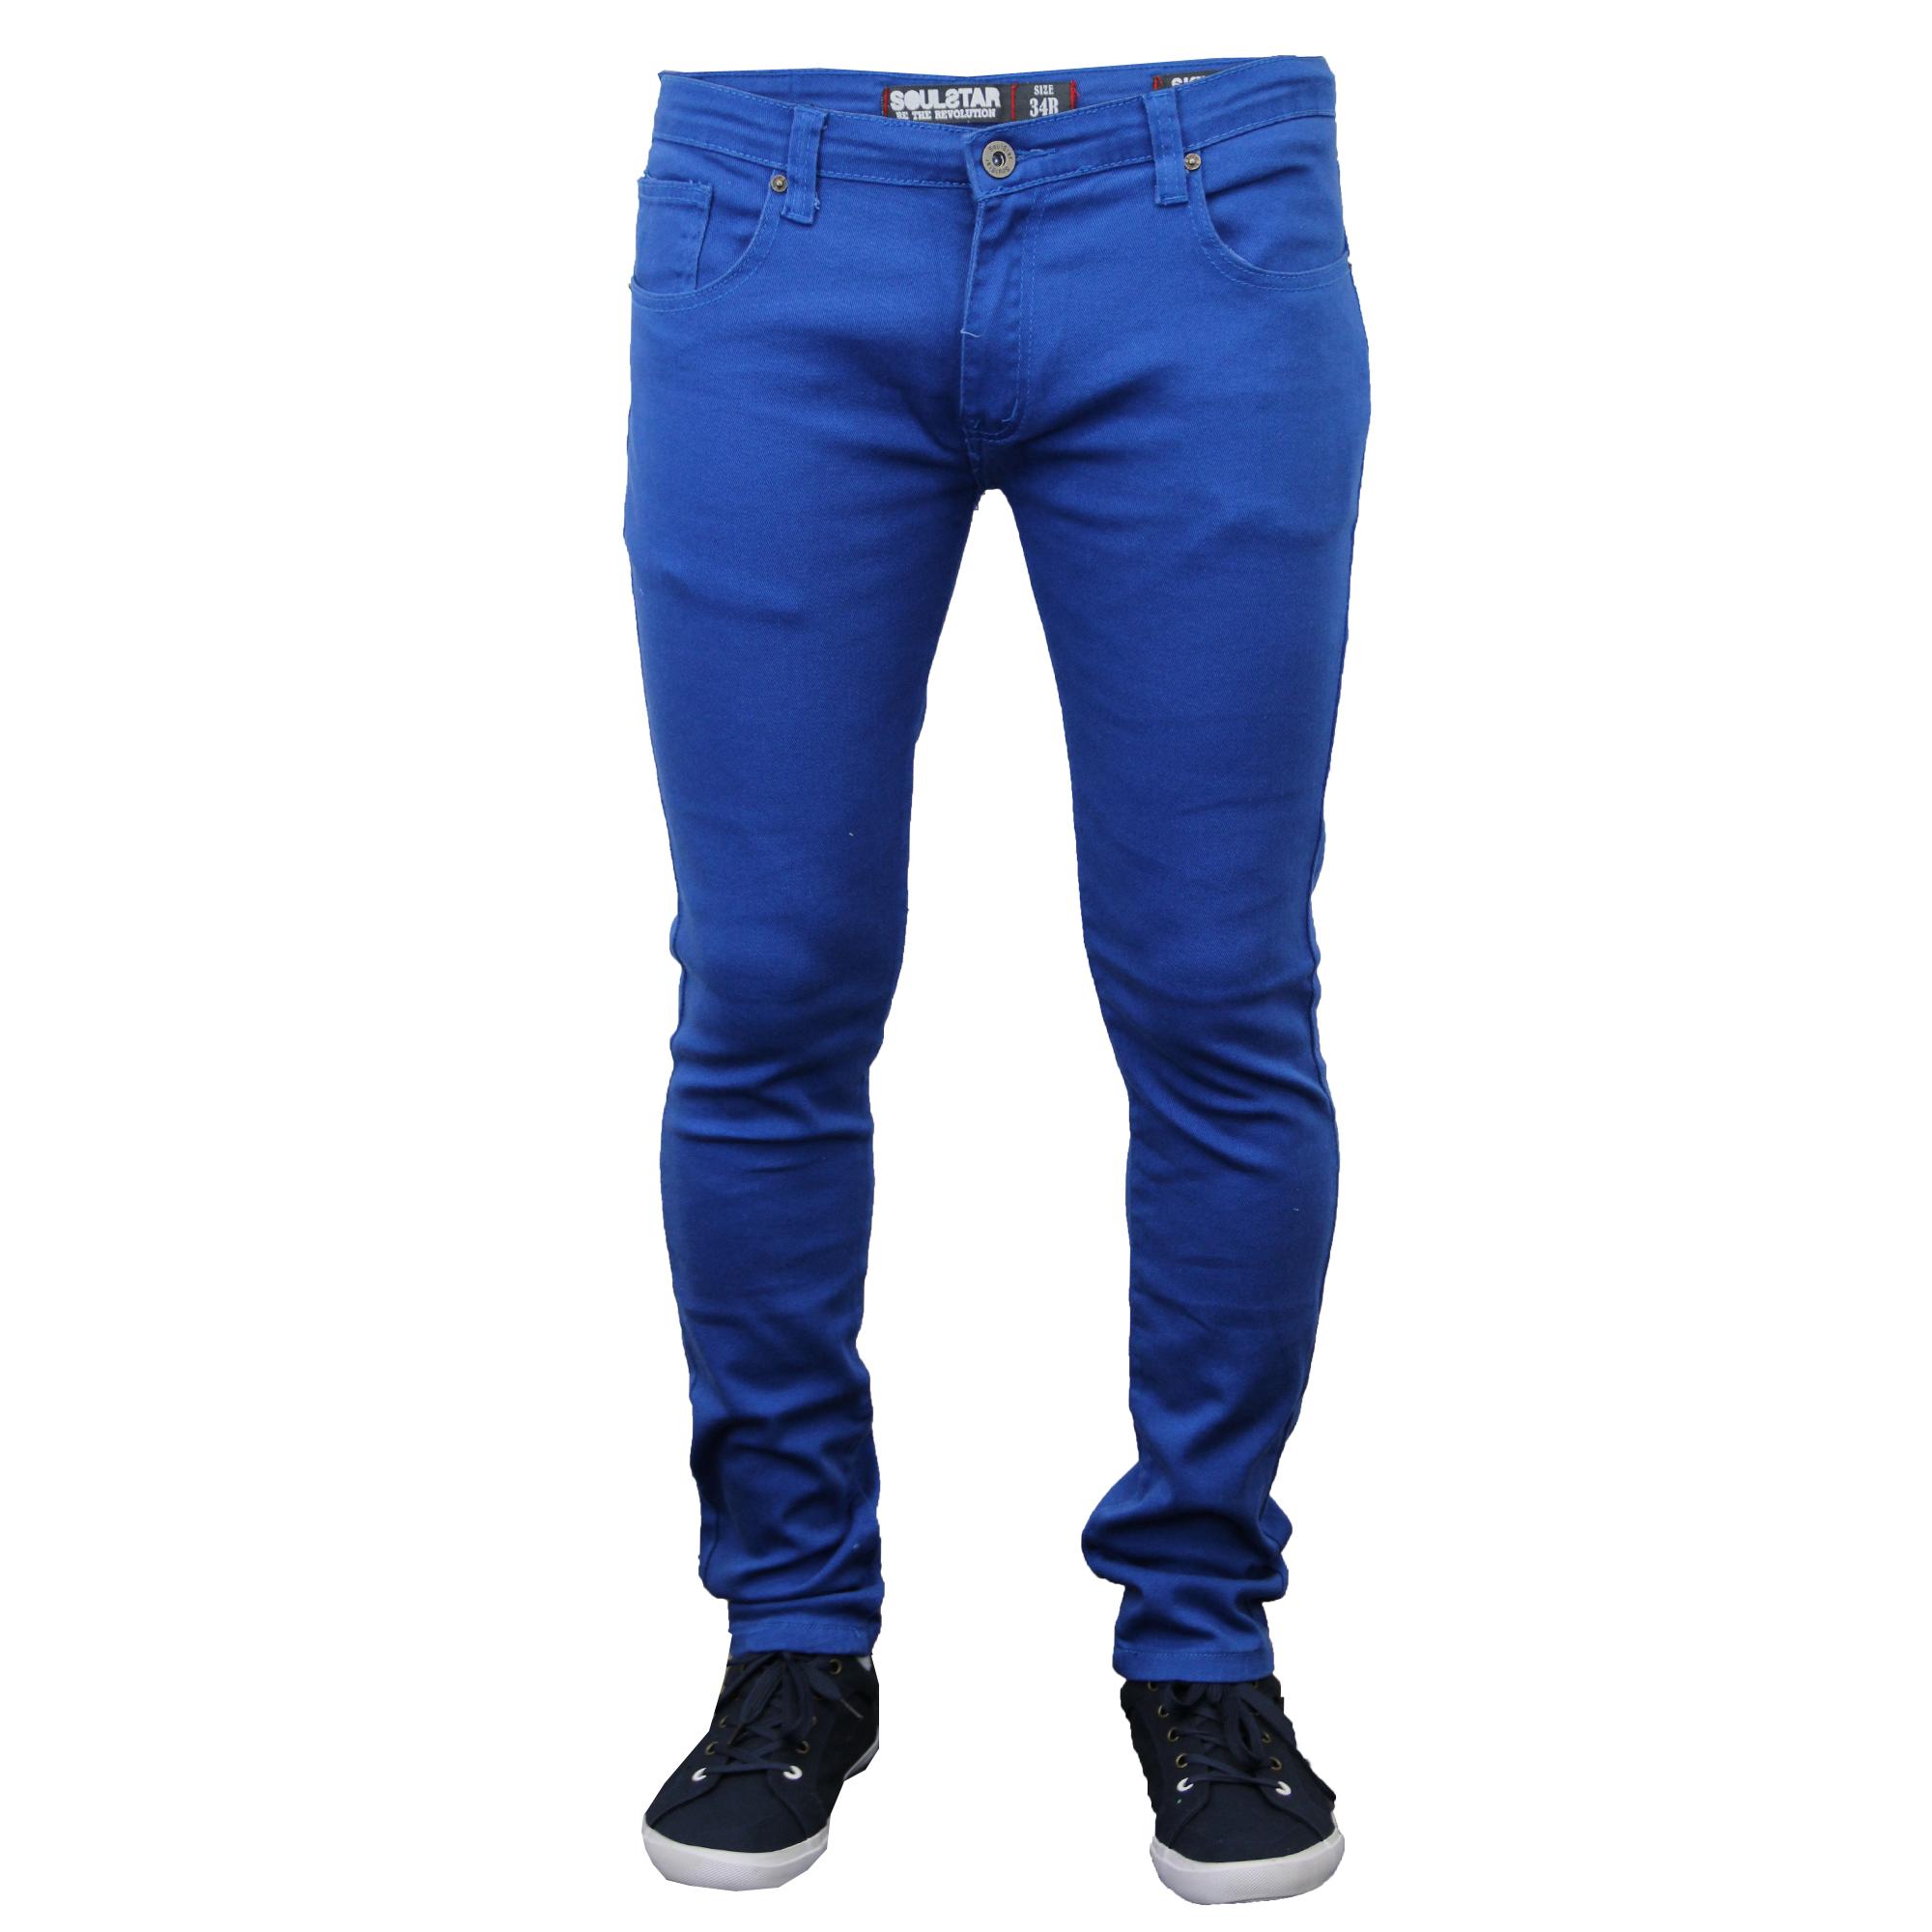 Mens-Skinny-Jeans-Soul-Star-Slim-Fit-Stretch-Denim-Pants-Trousers-Tapered-New